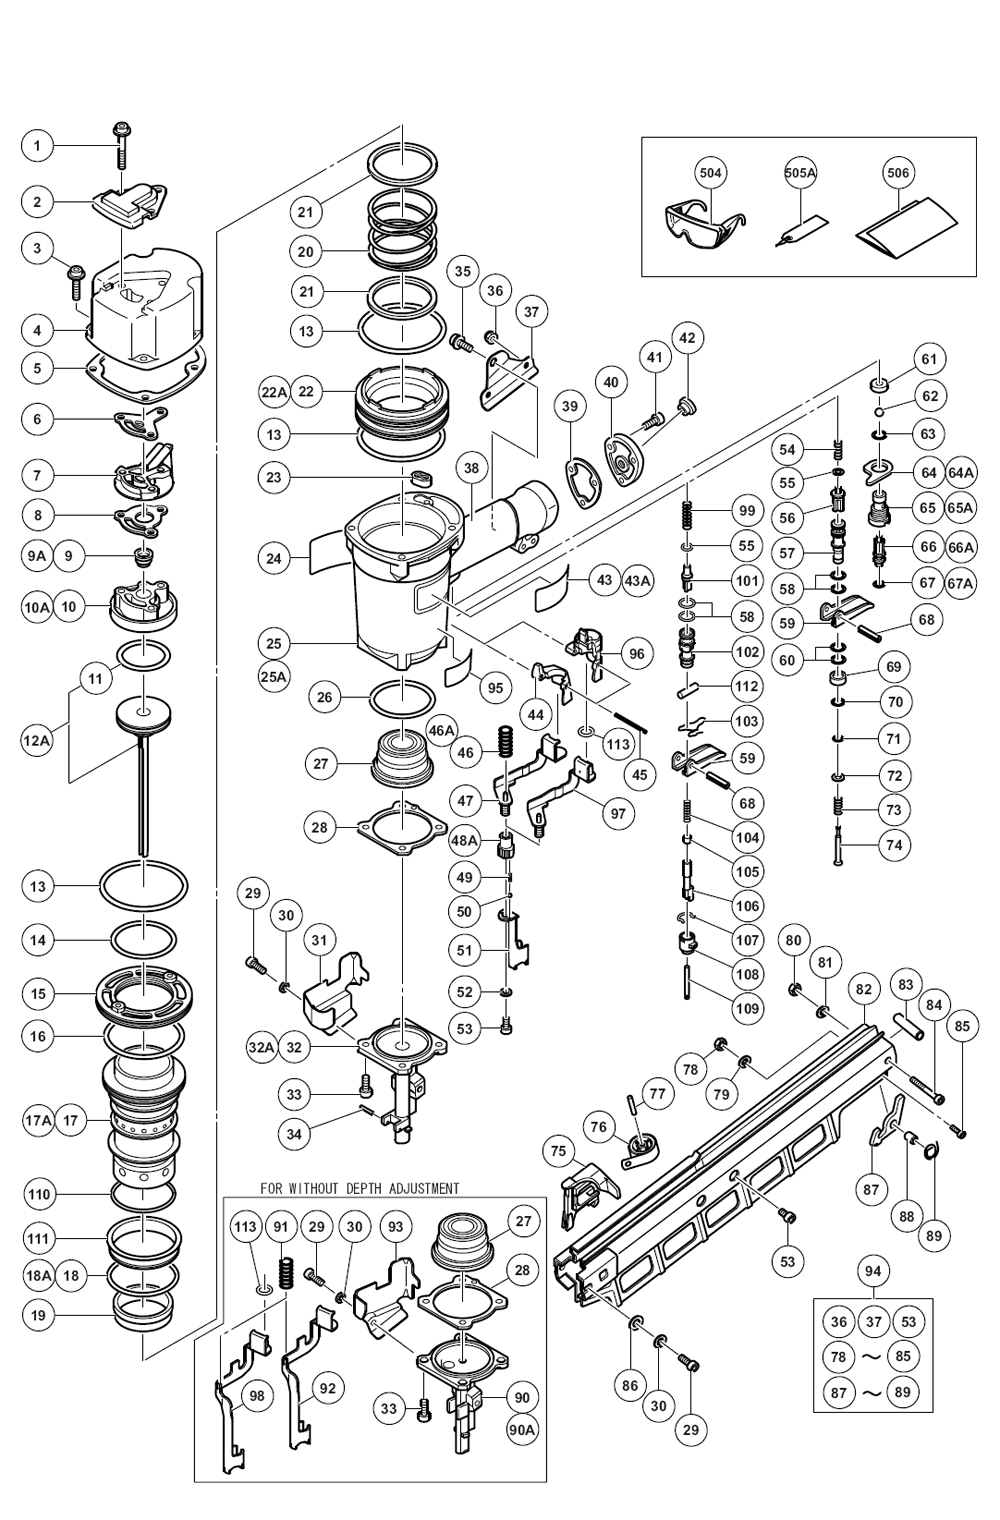 Hitachi    NR83A2 Y  Parts List      Hitachi    NR83A2 Y  Repair